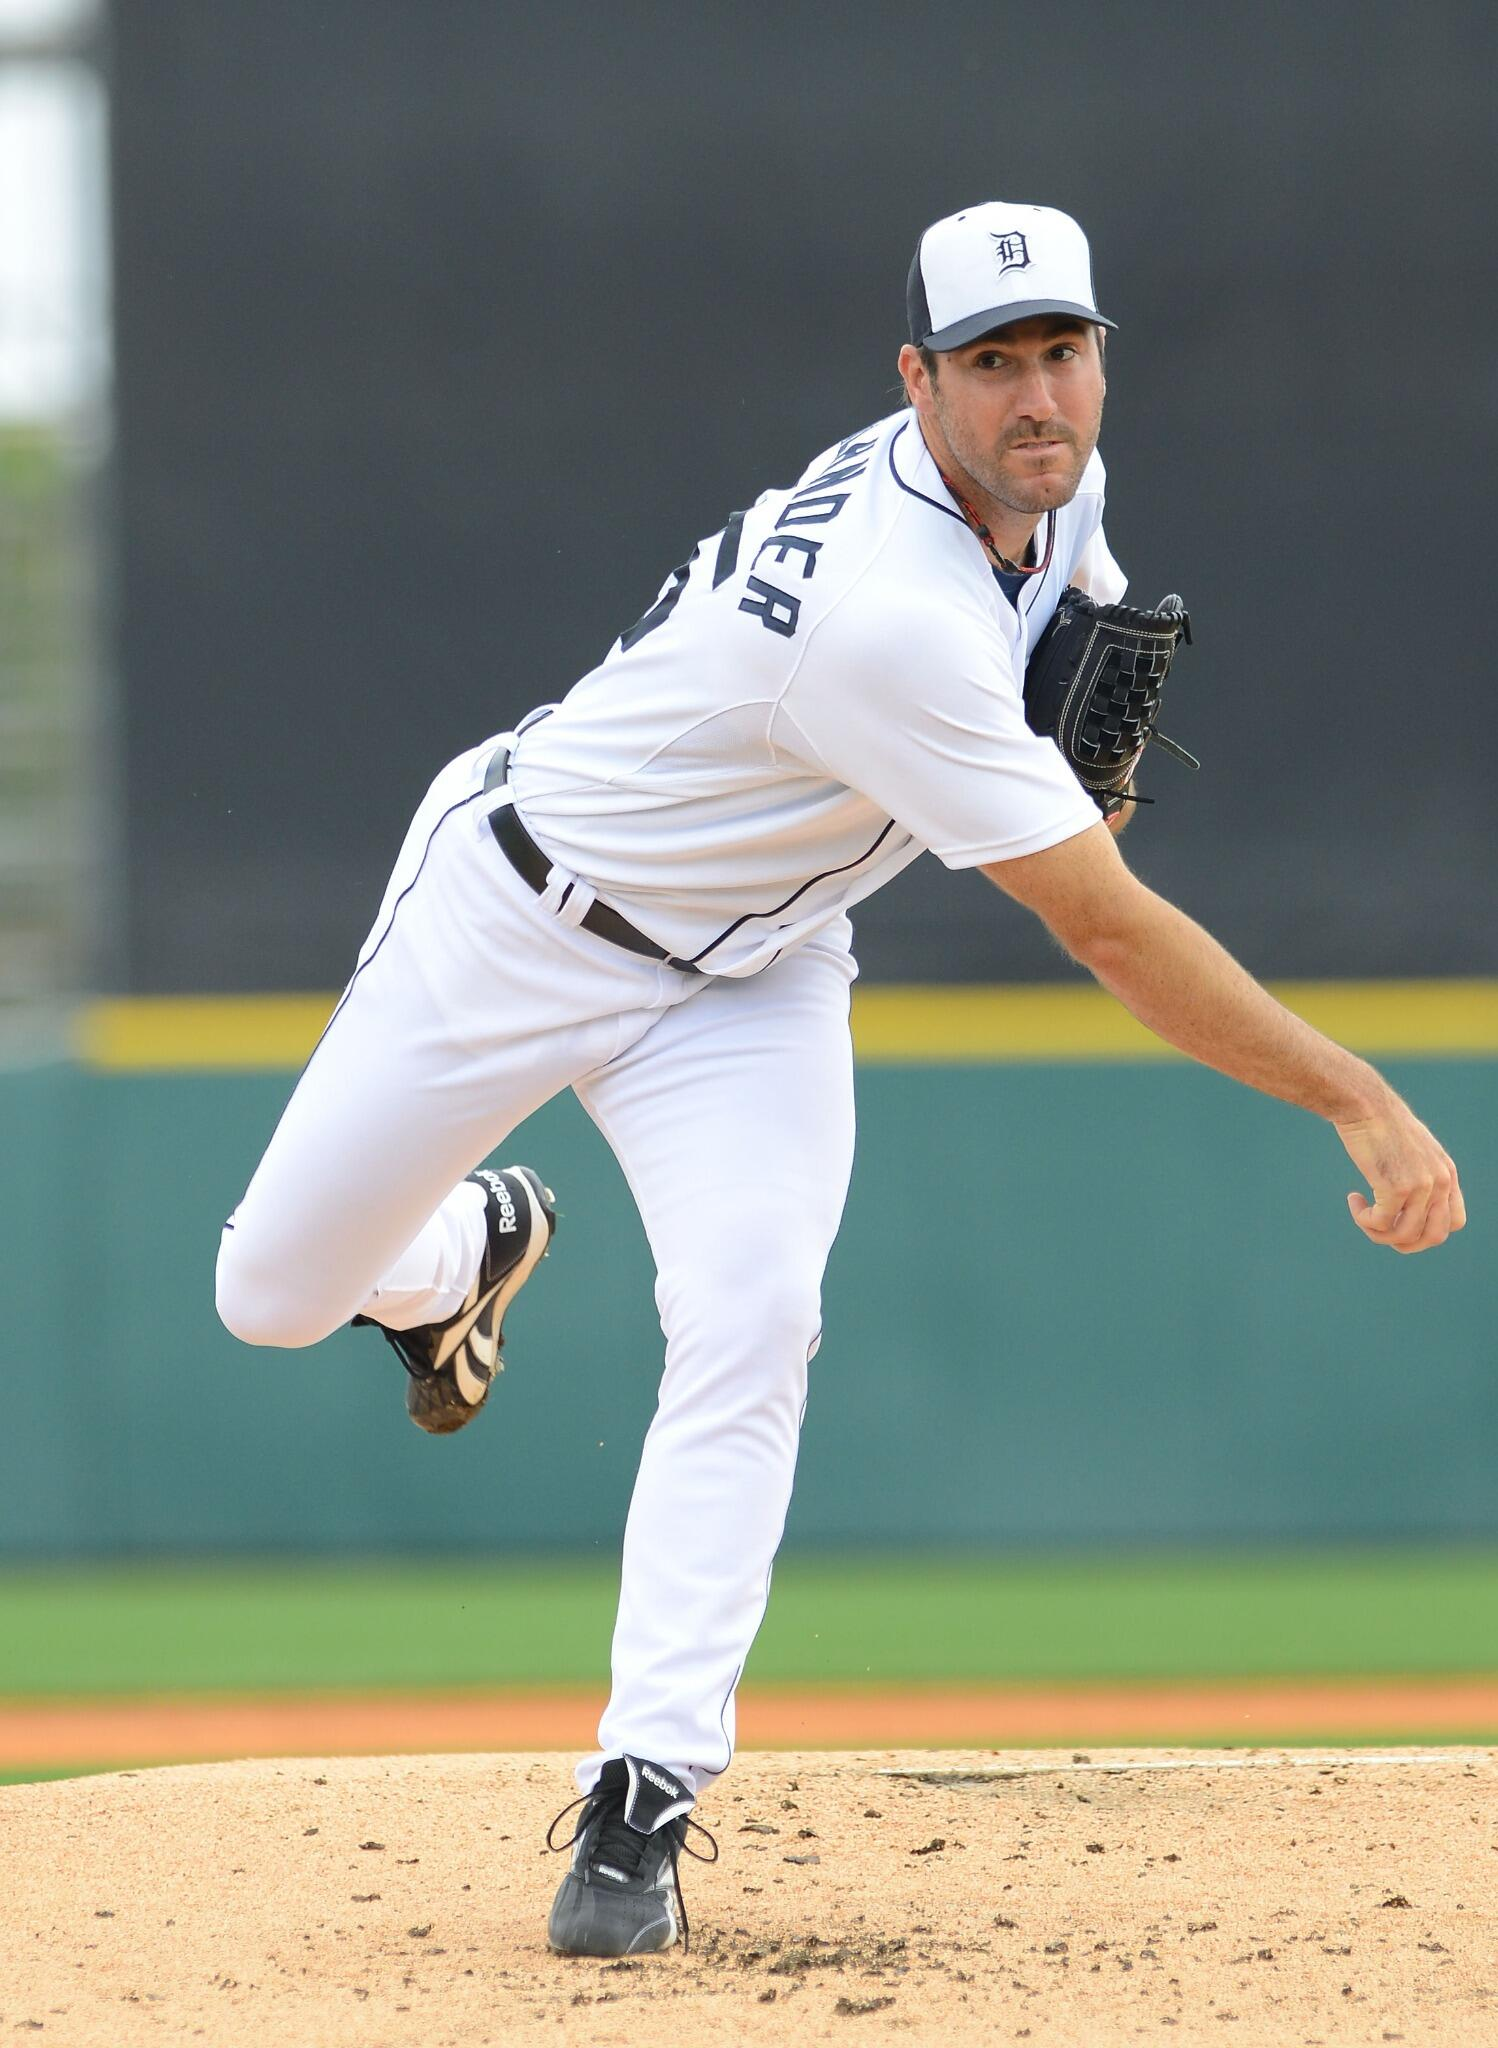 Pitchers and catchers: 10 days http://t.co/Vq4QauA6Kk